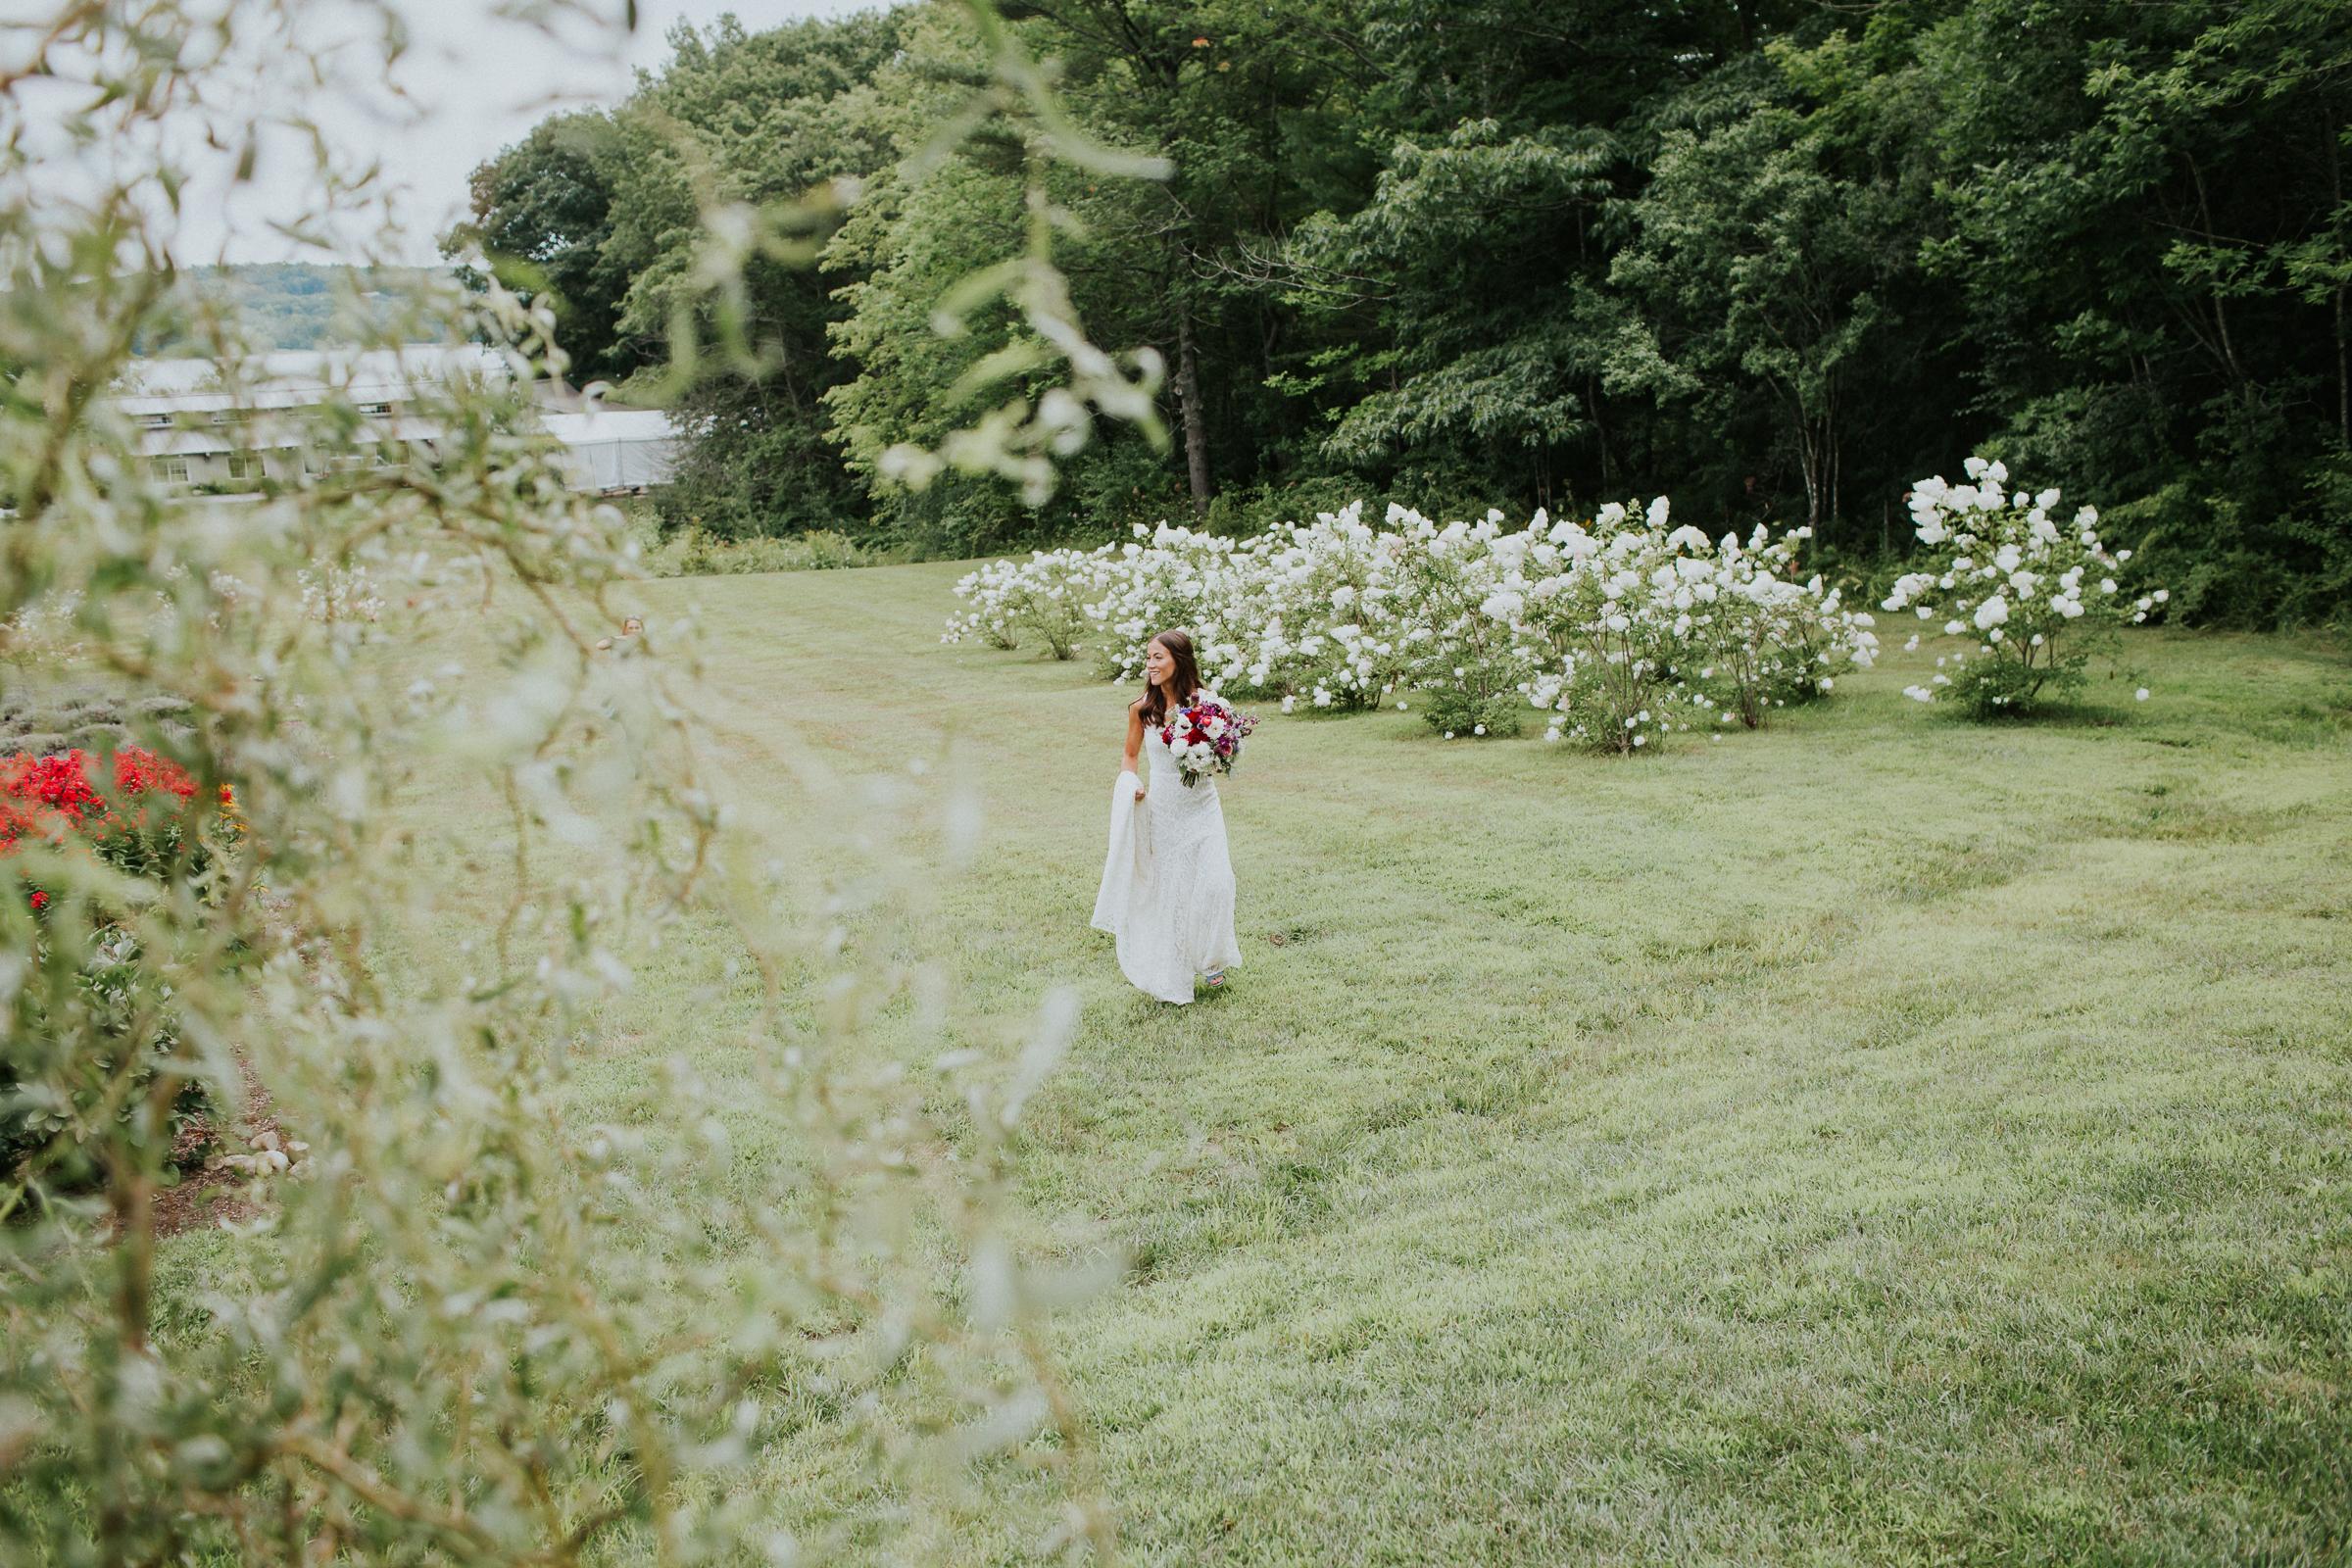 Marianmade-Farm-Wiscasset-Maine-Fine-Art-Documentary-Wedding-Photographer-Elvira-Kalviste-Photography-28.jpg